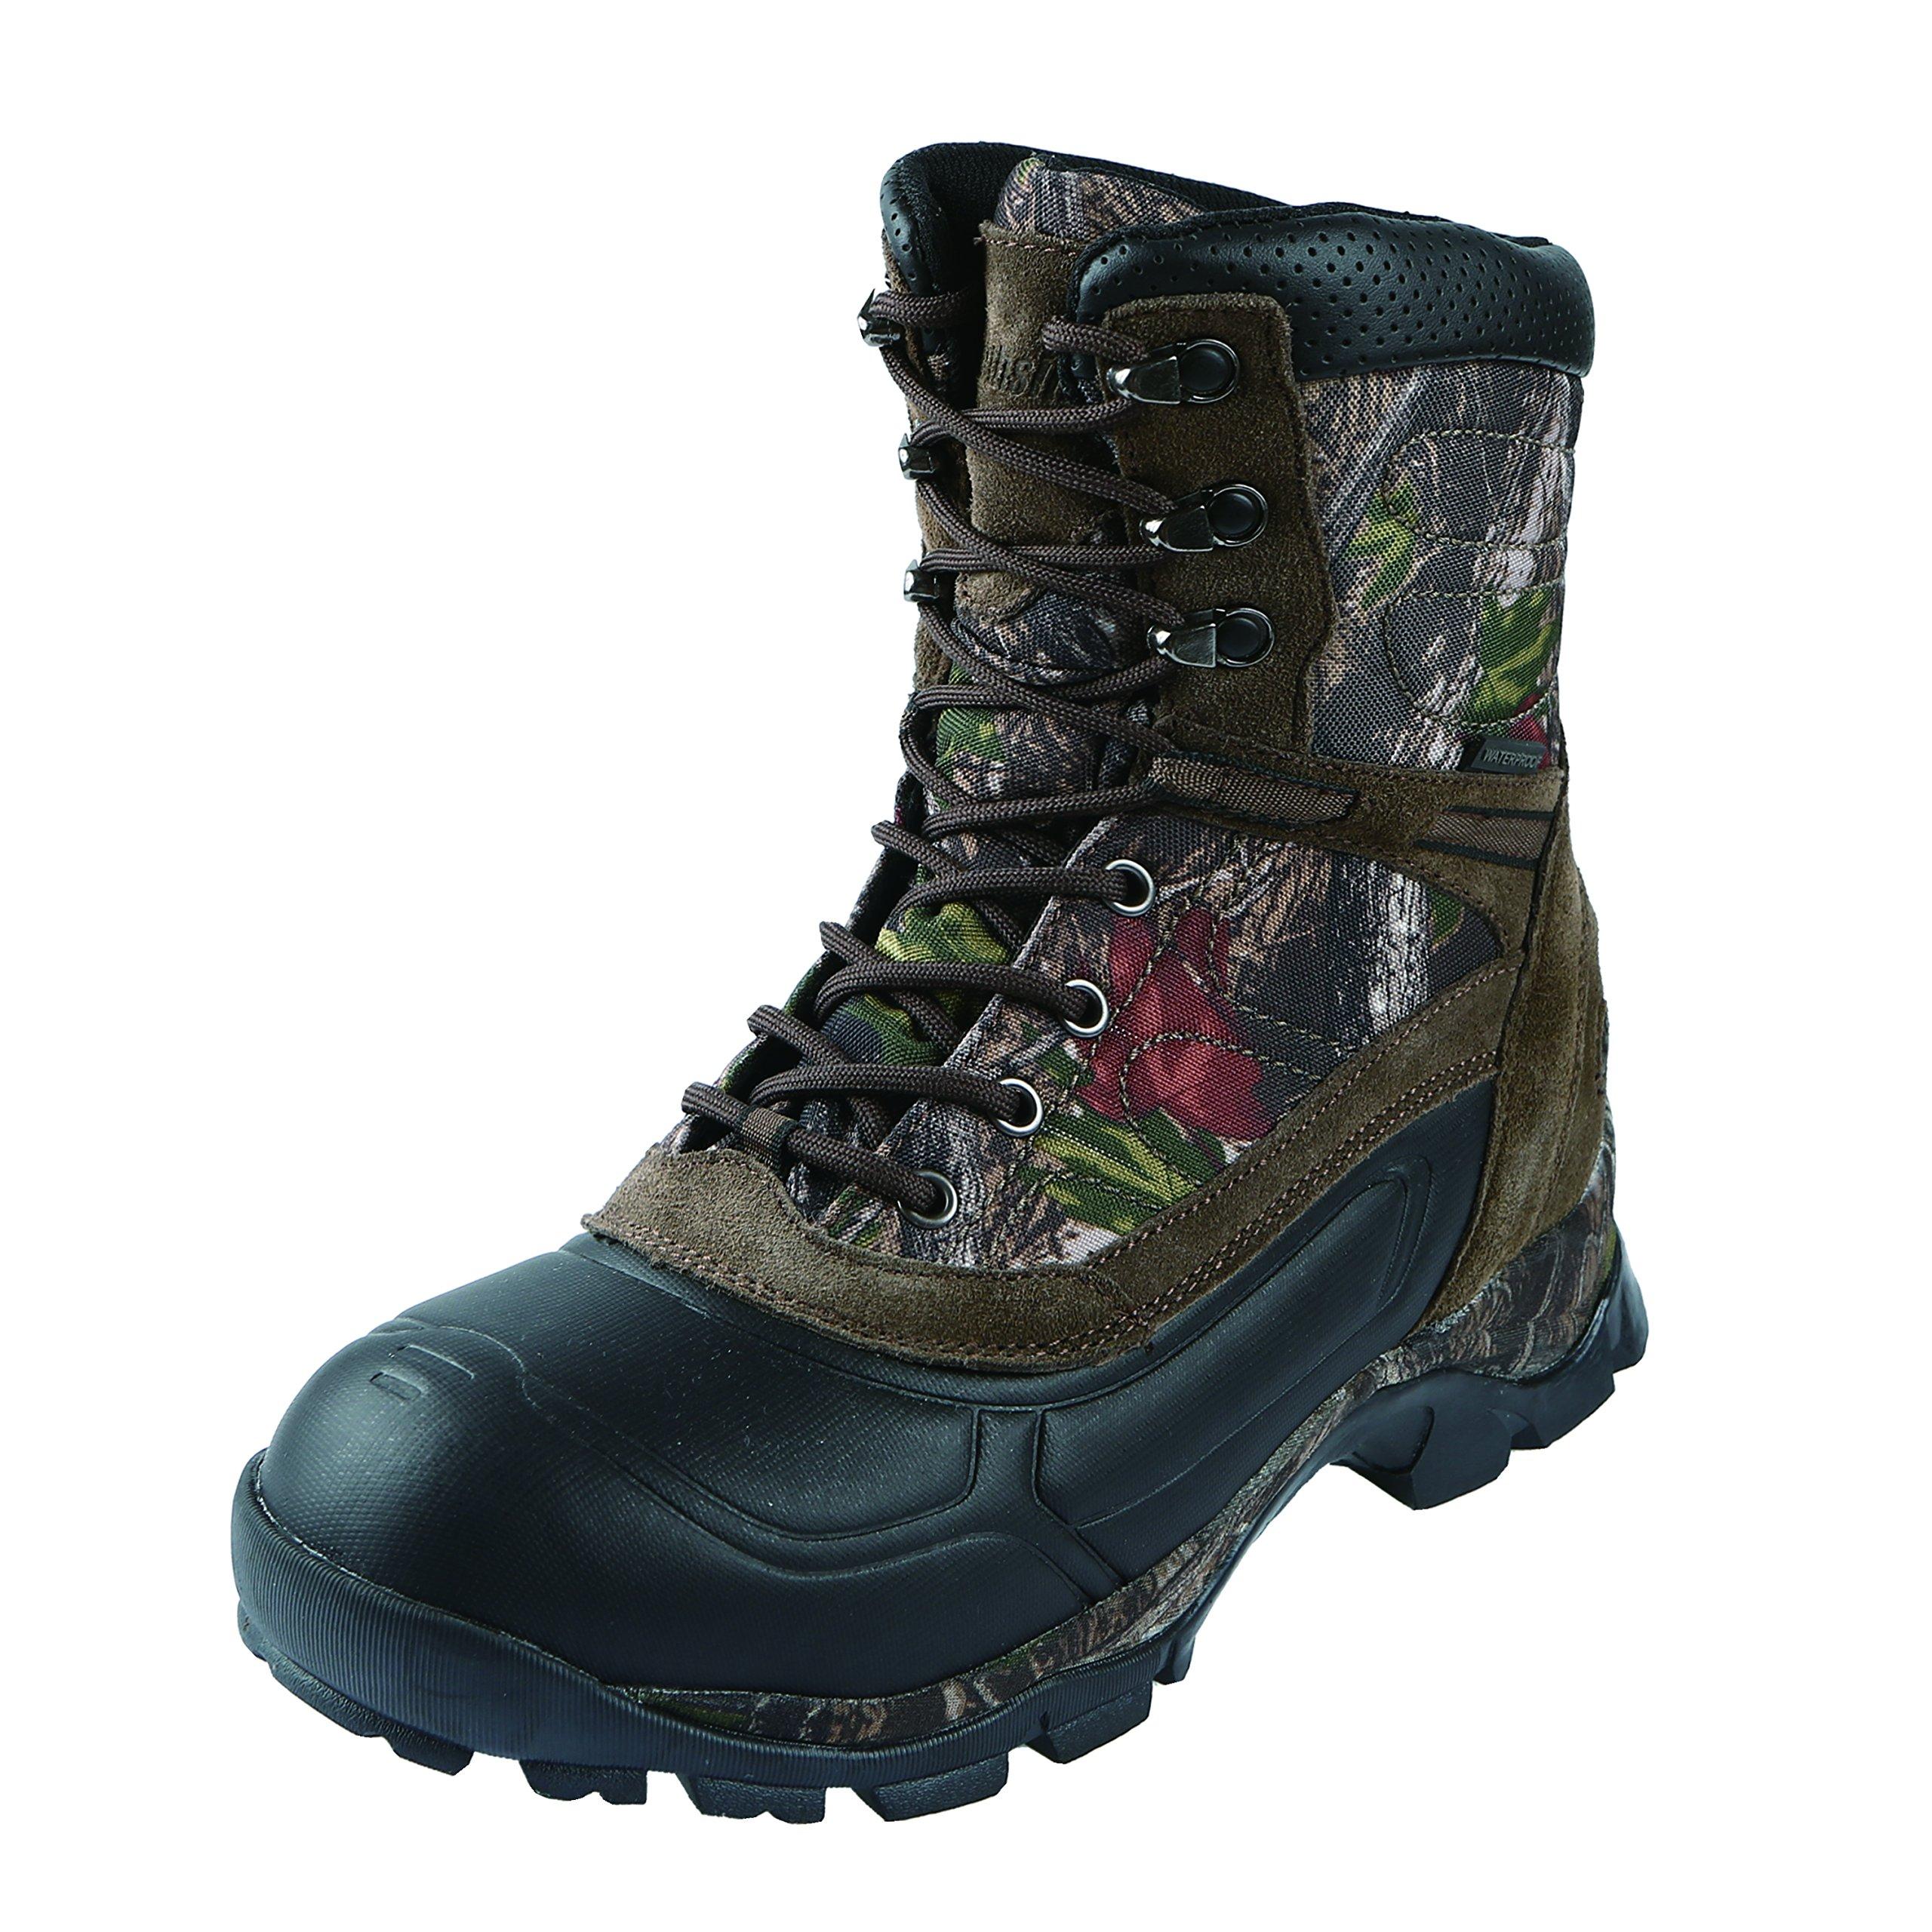 Northside Men's Banshee 600 Hunting Boot, Brown Camo, 8.5 M US